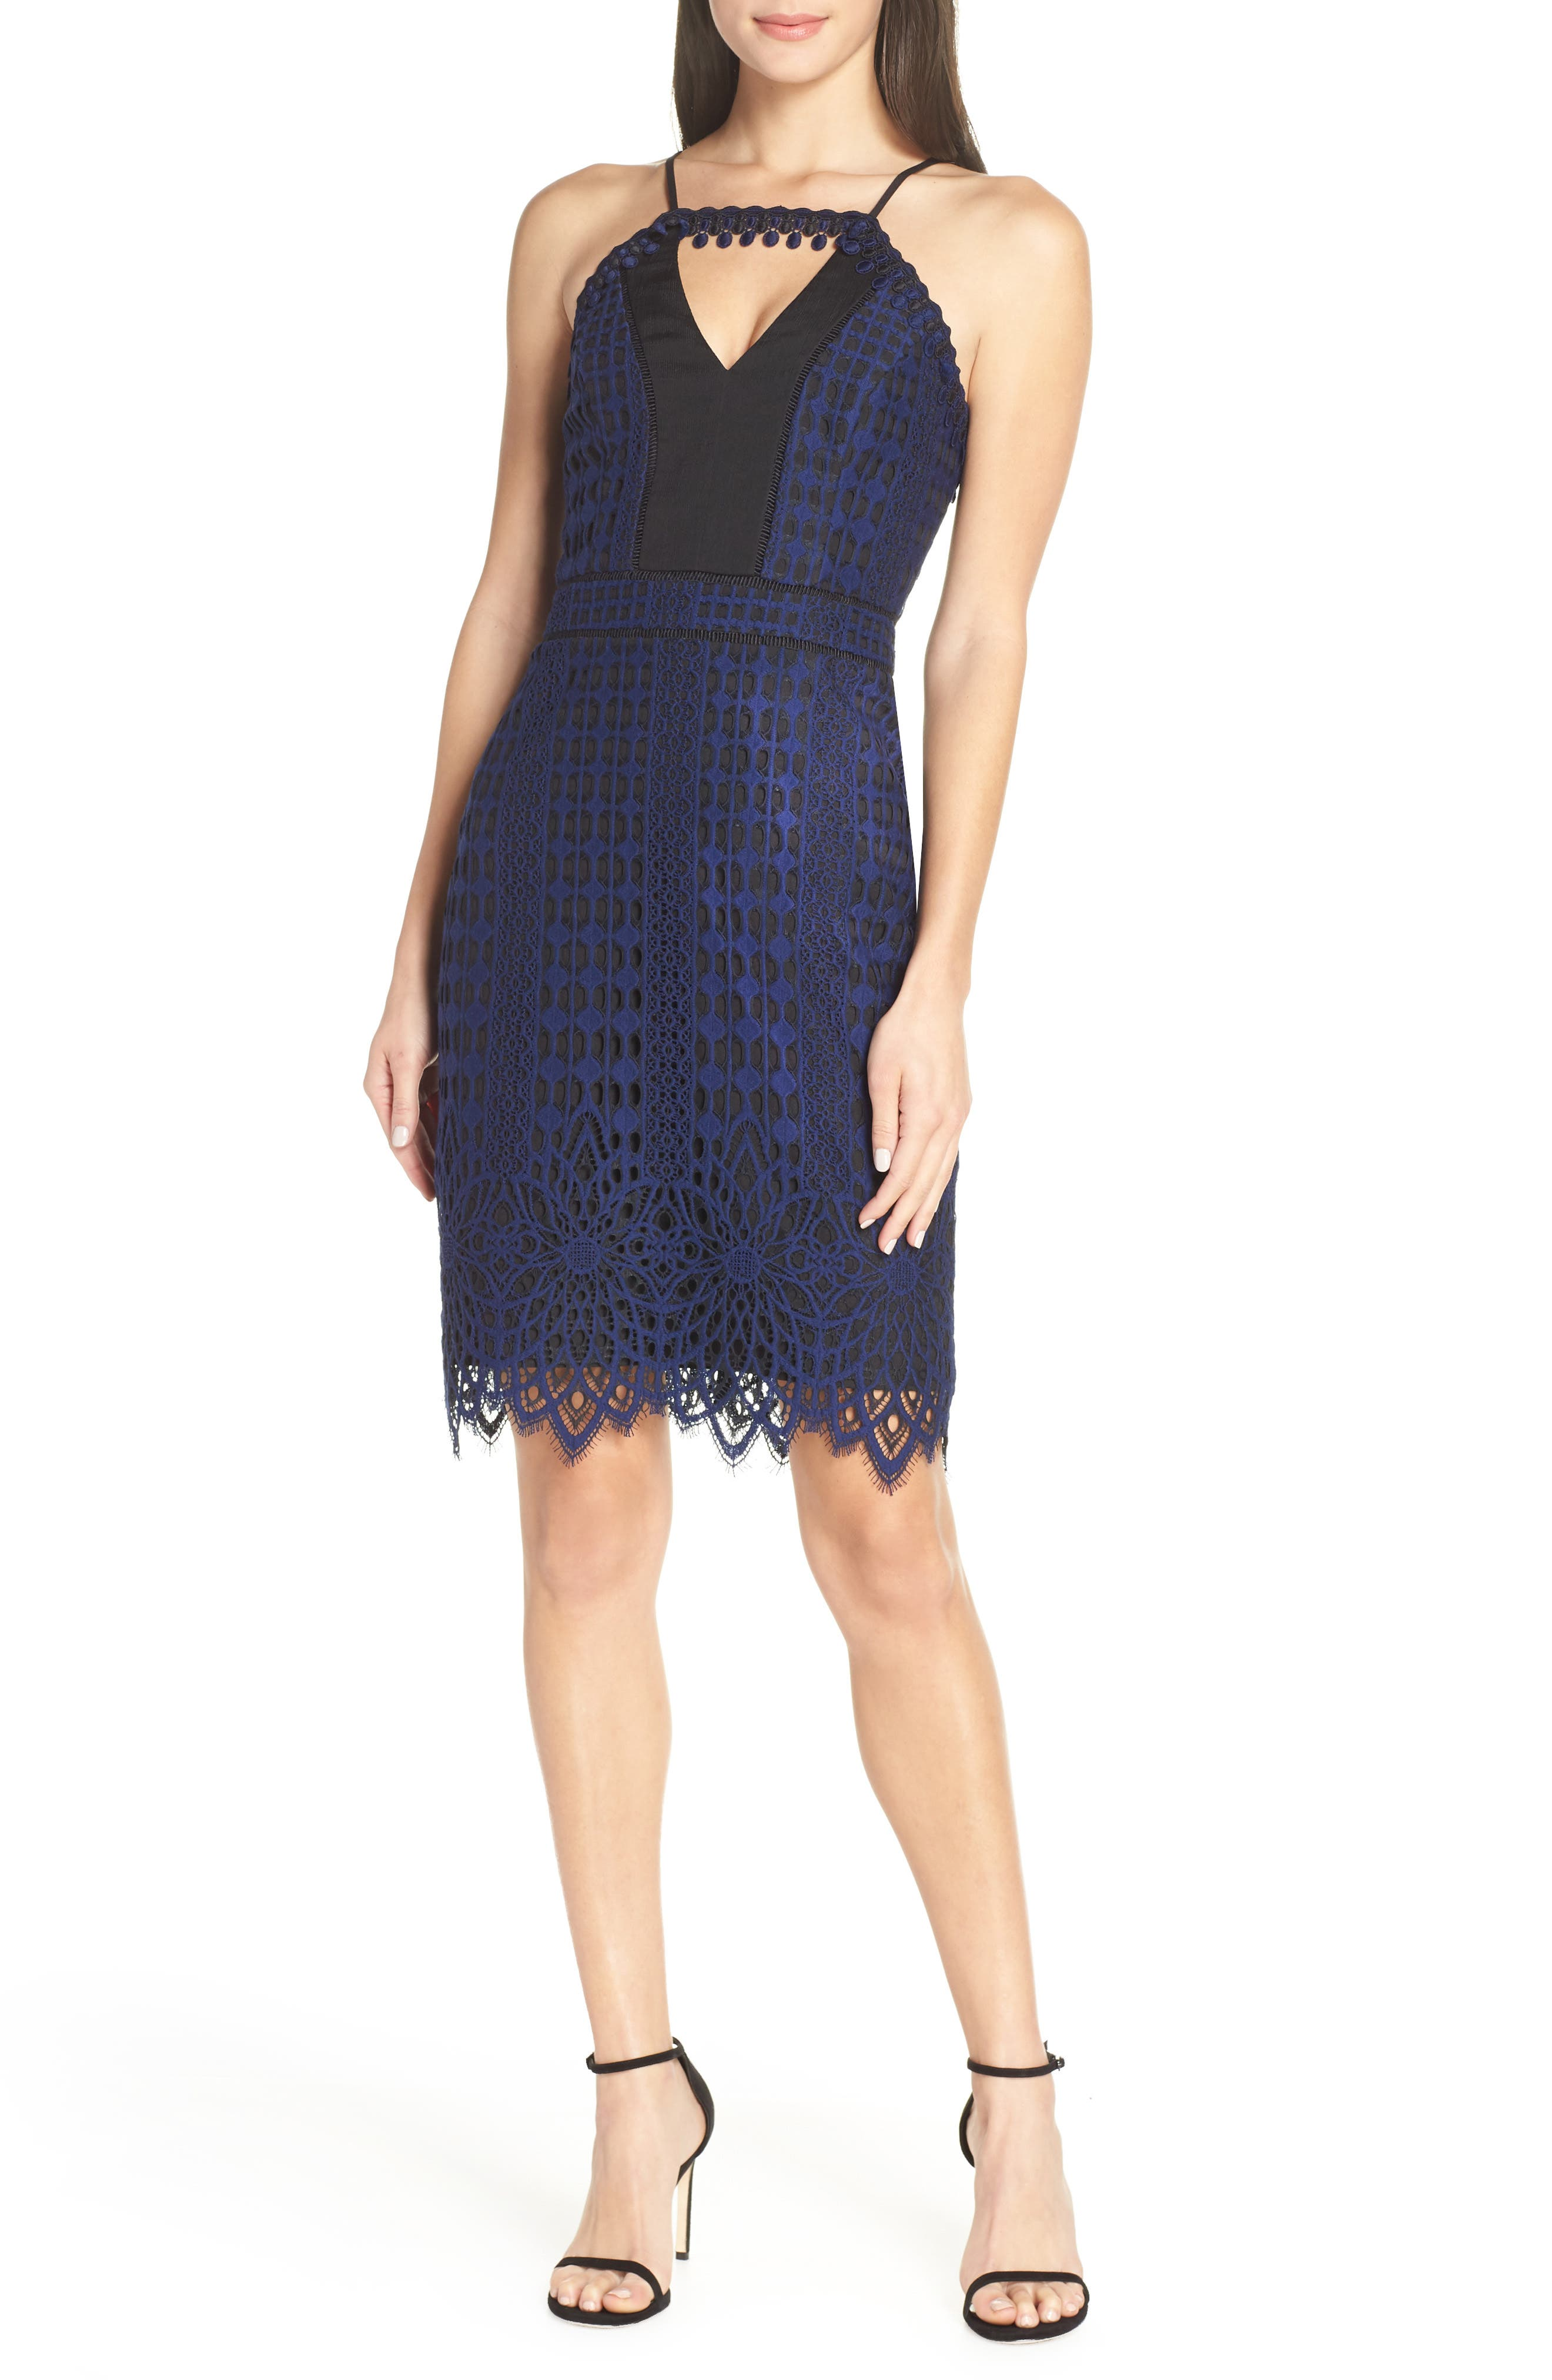 HARLYN Contrast Chiffon Lace Halter Body-Con Dress, Main, color, NAVY